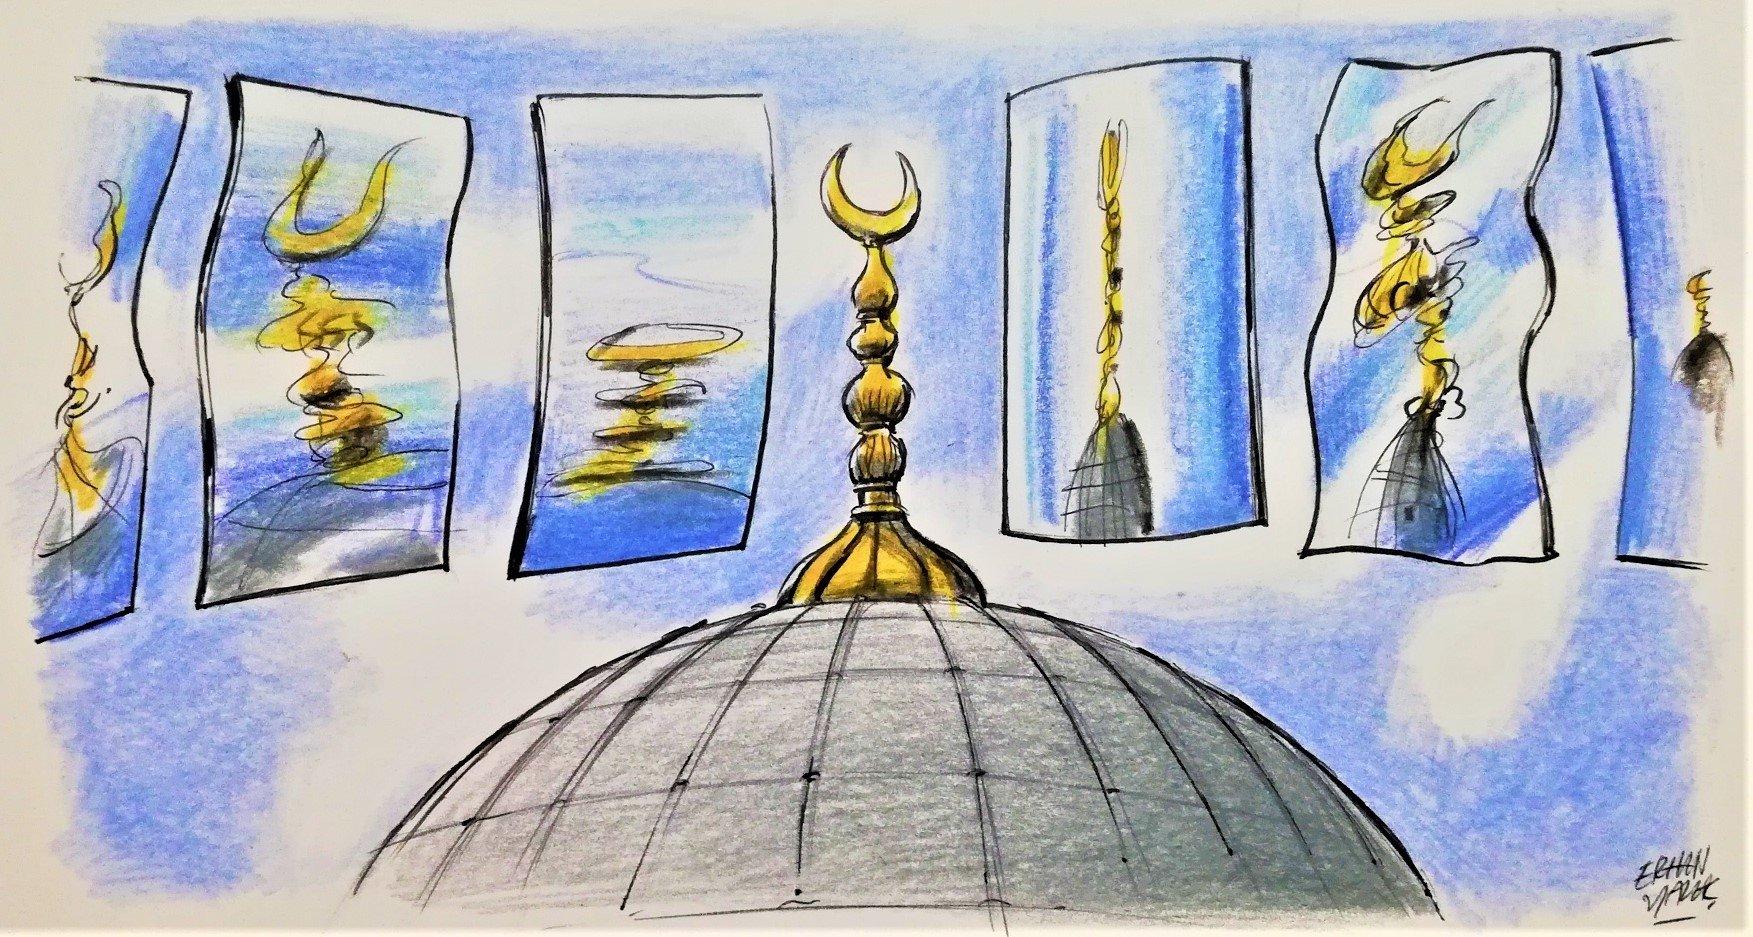 France's Macron, CHP's Kılıçdaroğlu: A discussion on Turkish politics